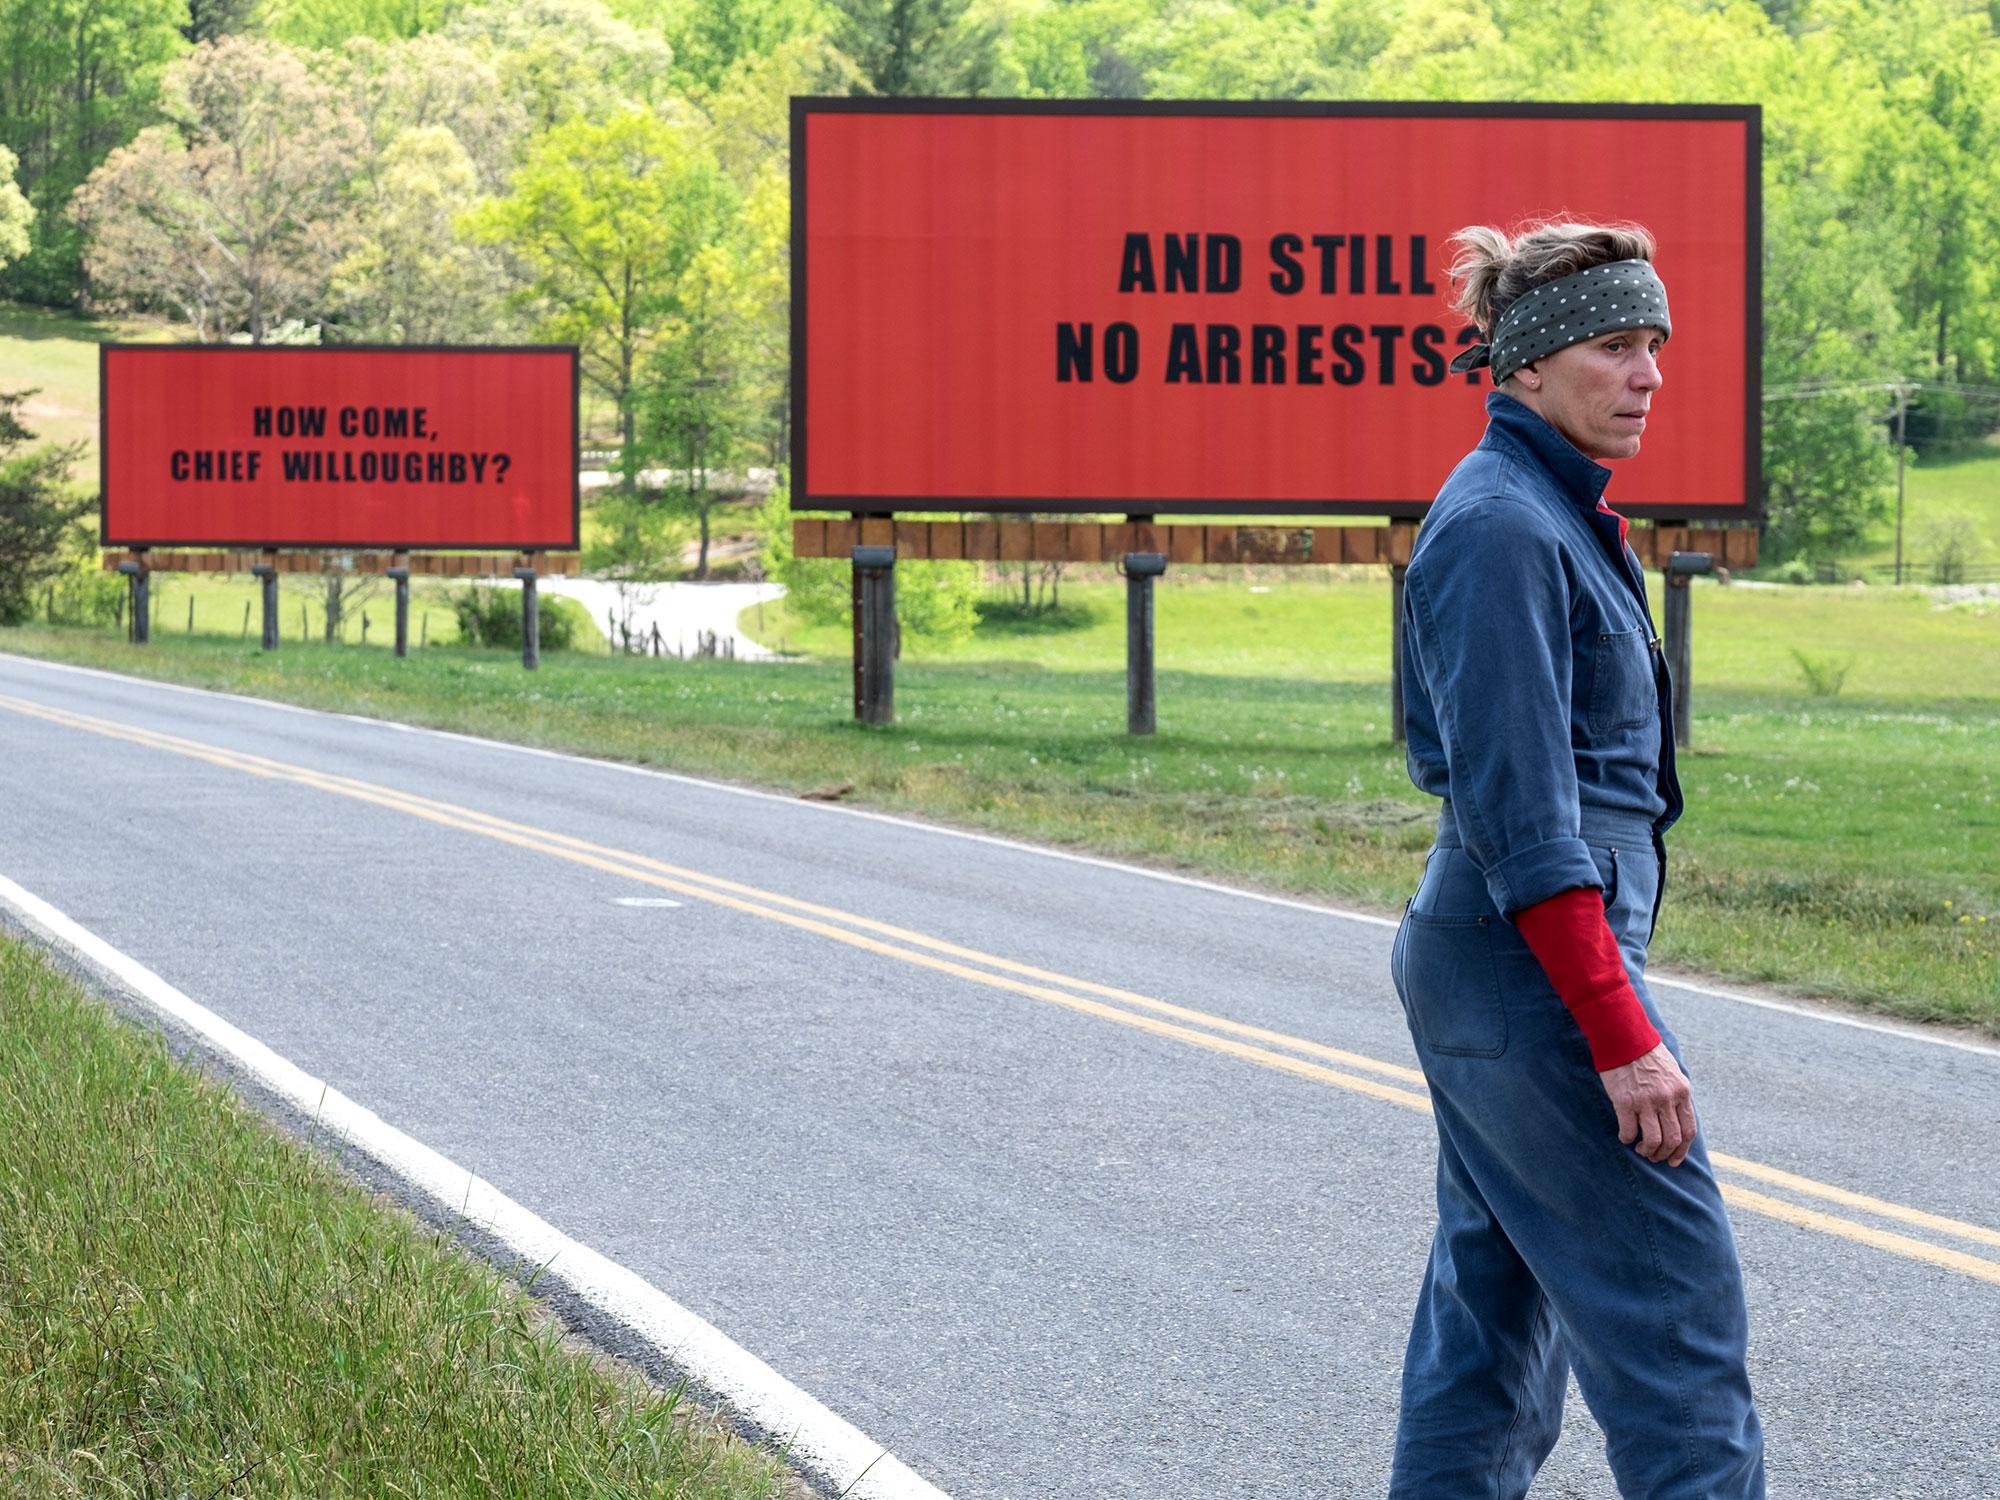 https://cinemaplanet.pt/wp-content/uploads/2017/09/three-billboards-outside-ebbing-missouri.jpg